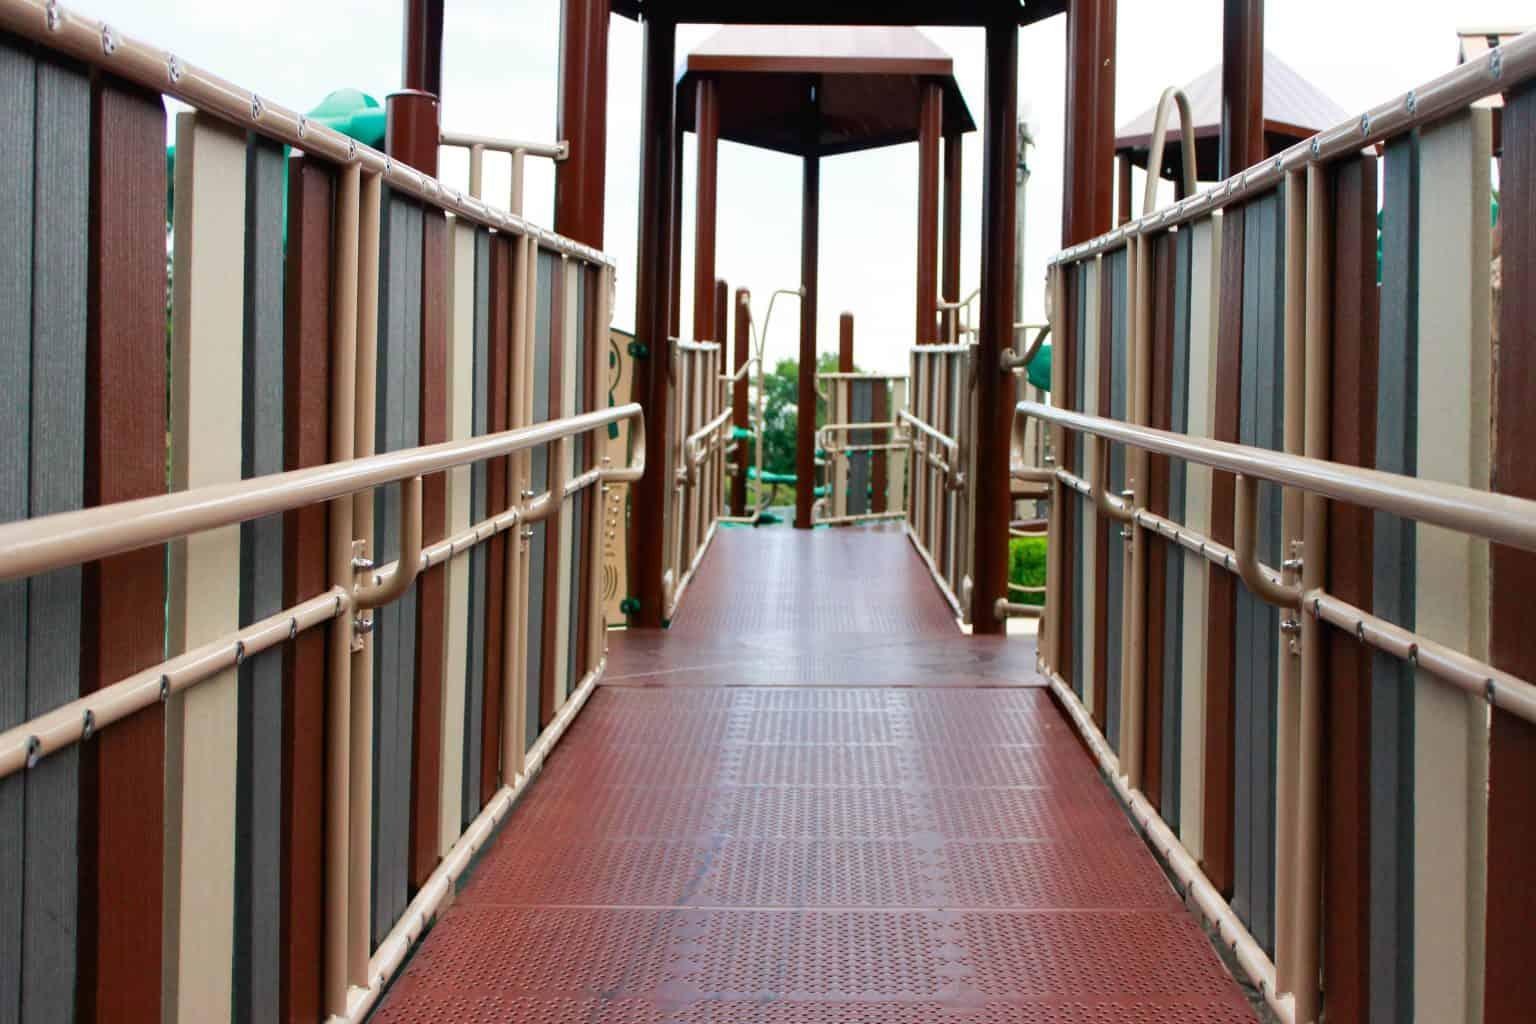 windward-beach-park-playground-brick-nj_27651421173_o-1536x1024